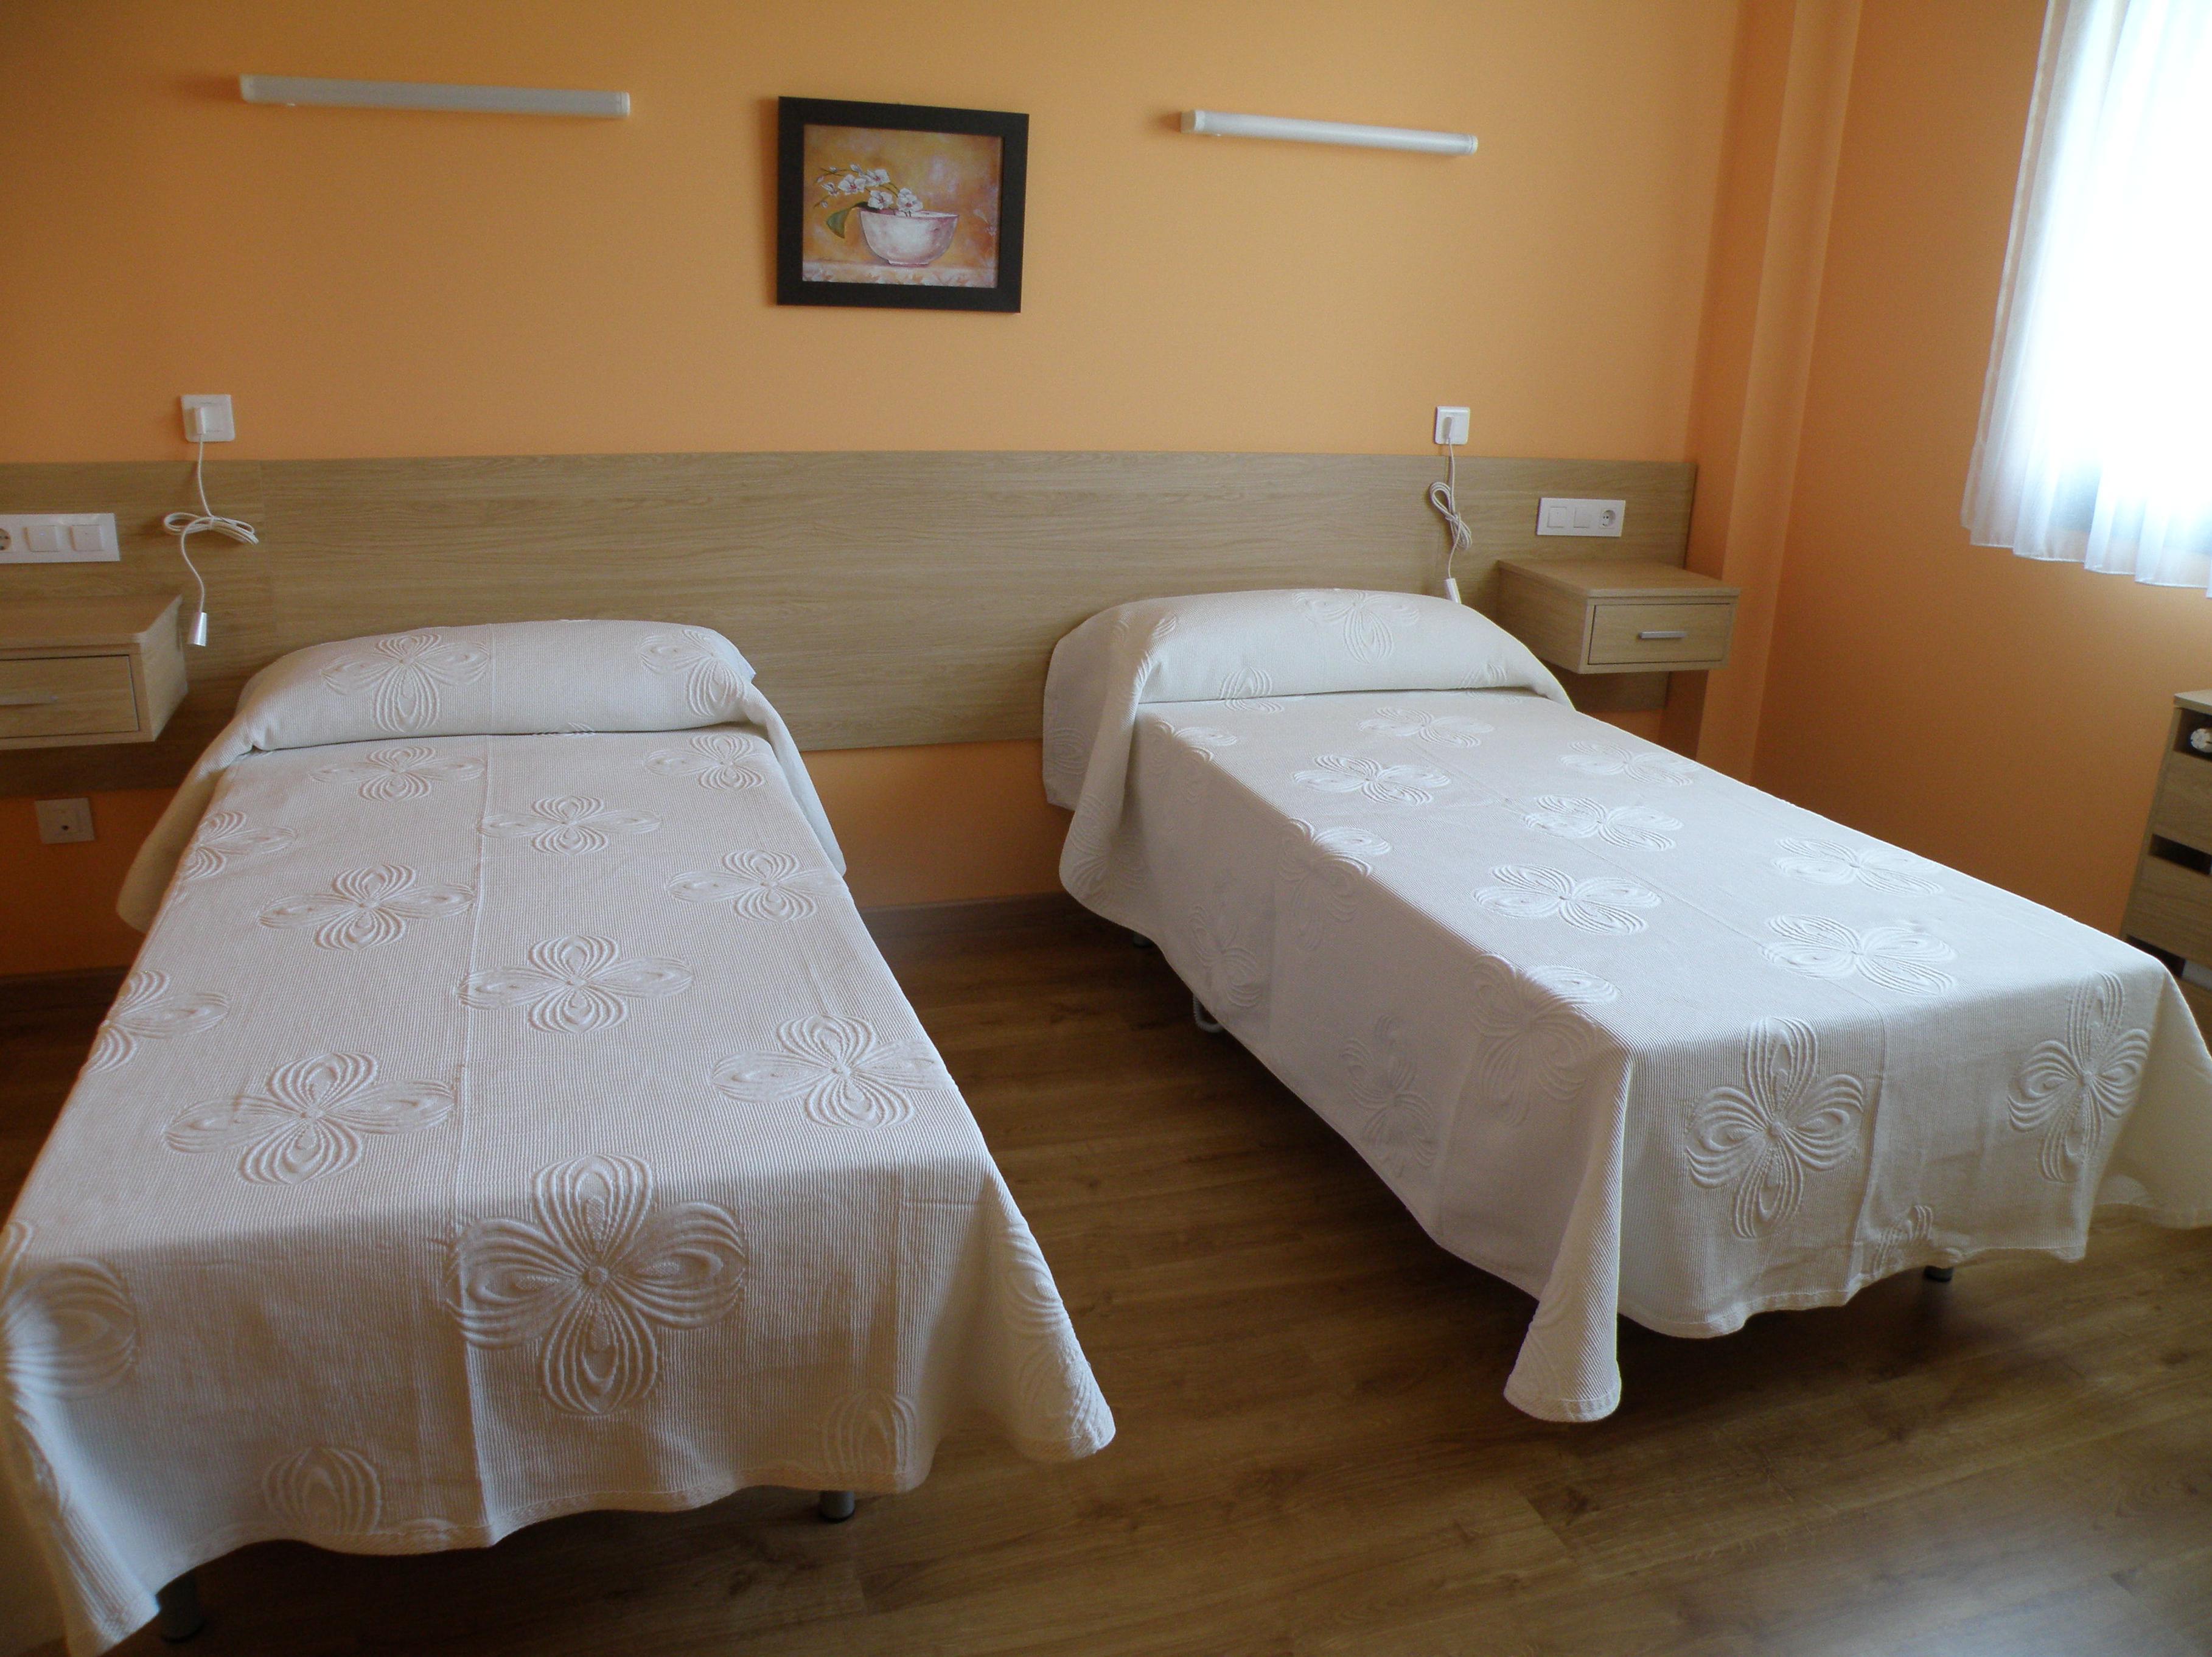 Foto 4 de Residencias de ancianos en Oviedo | Residencia Geriátrica Santirso